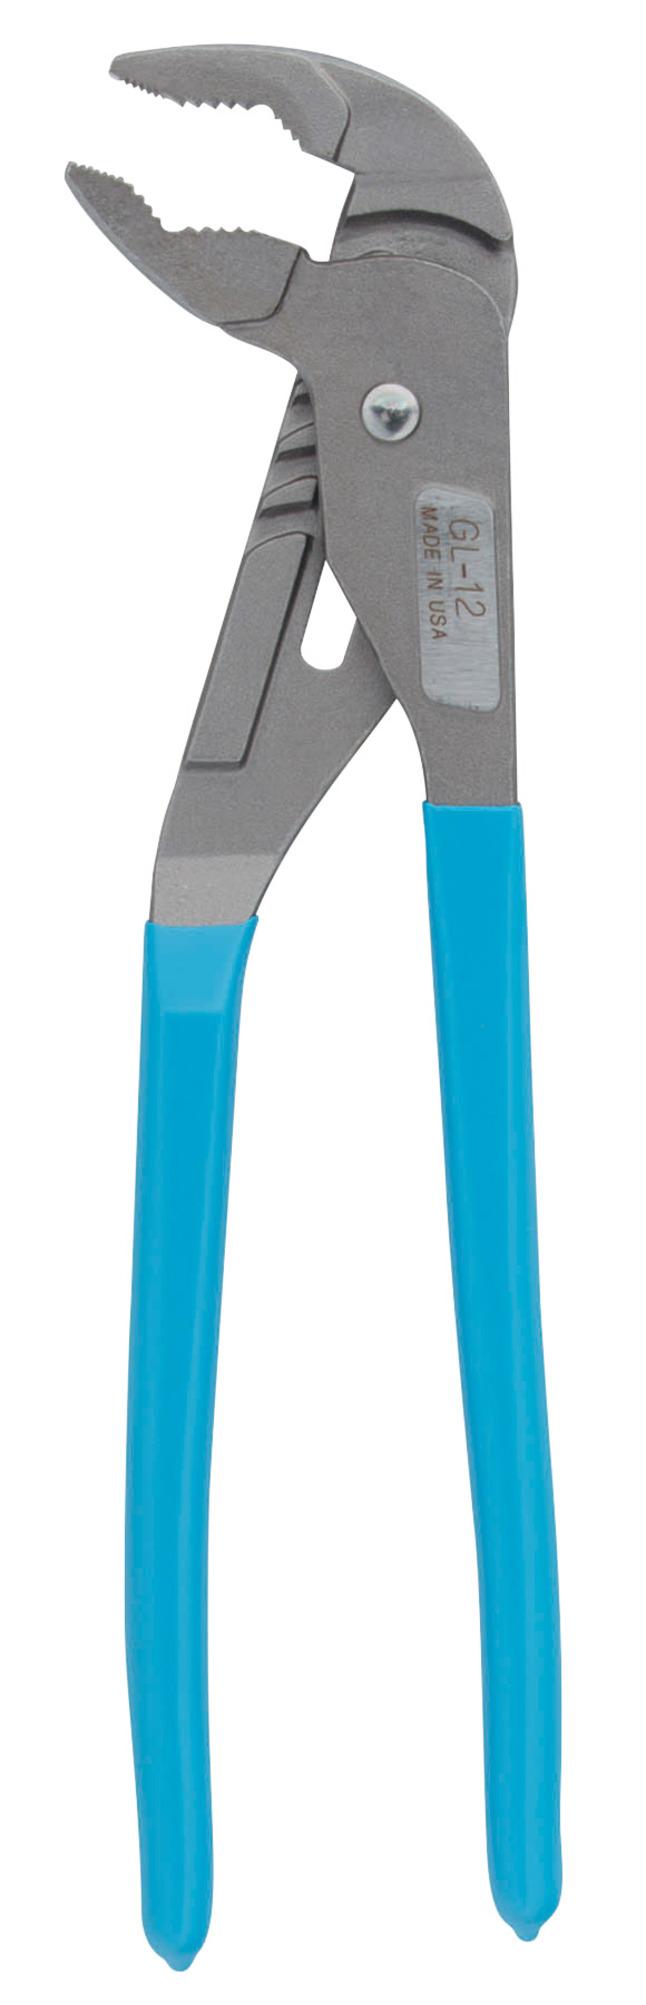 Pliers Supplies, Item Number 1047814